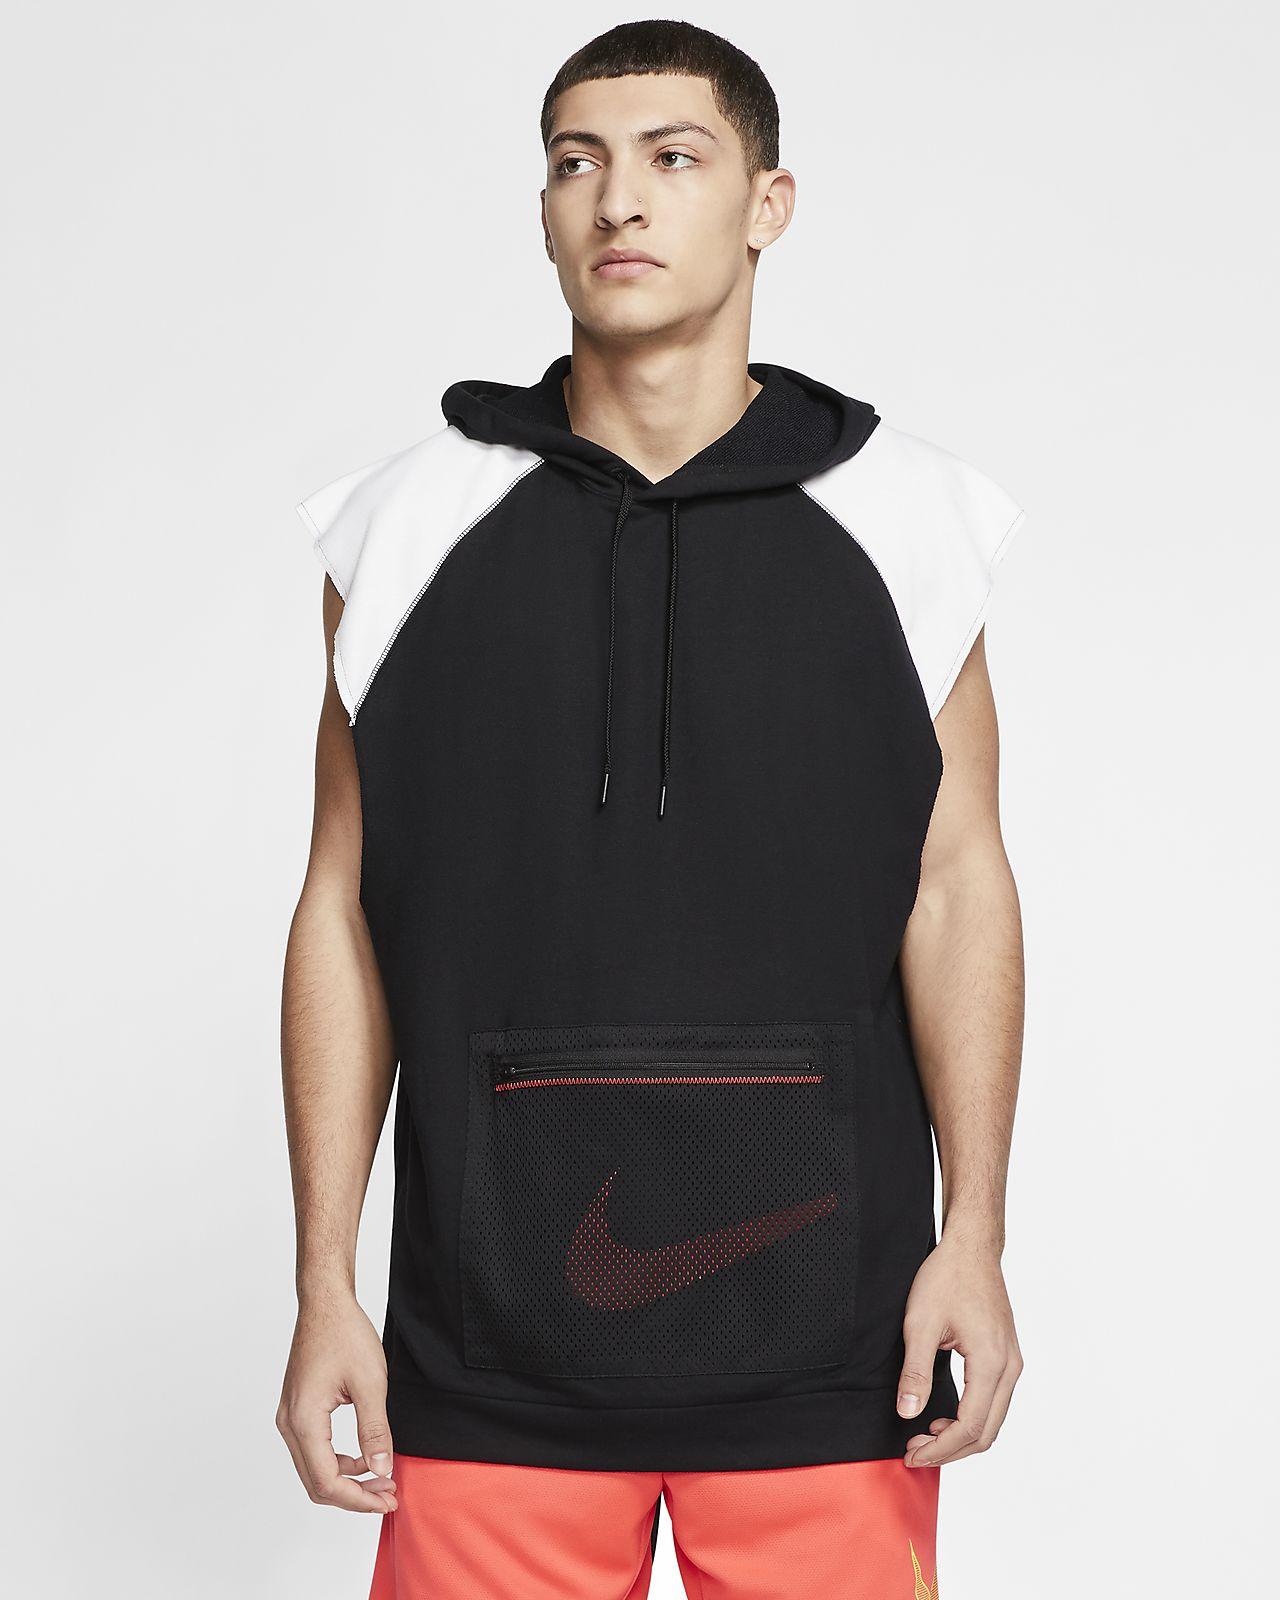 Nike Dri-FIT Men's Sleeveless Fleece Training Hoodie